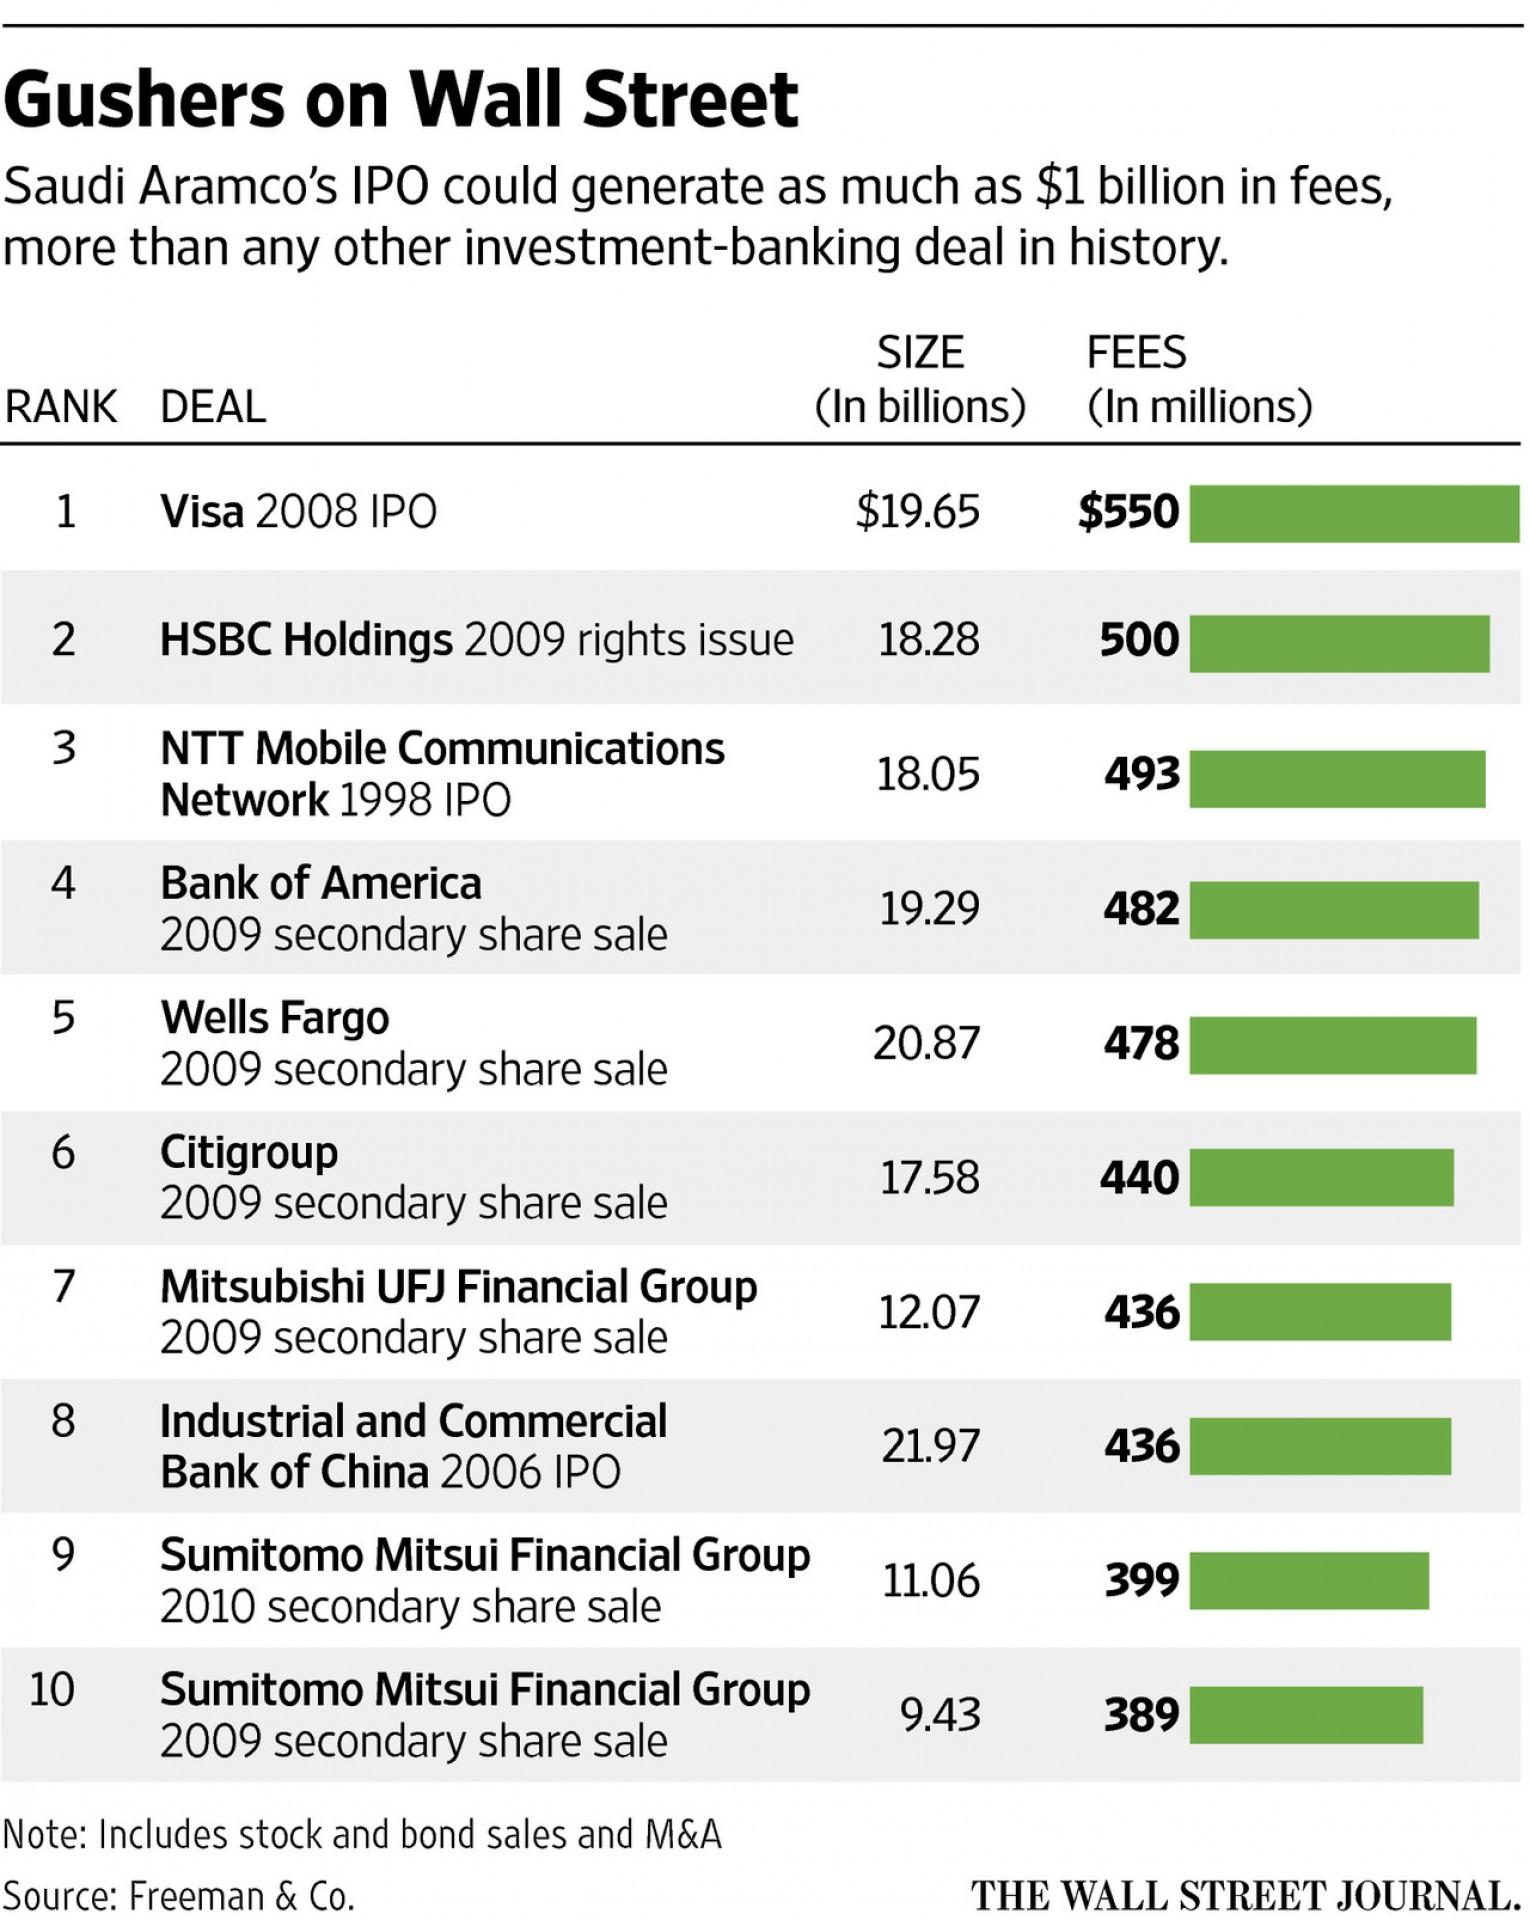 IPO Saudi Aramco принесет банку рекордный гонорар